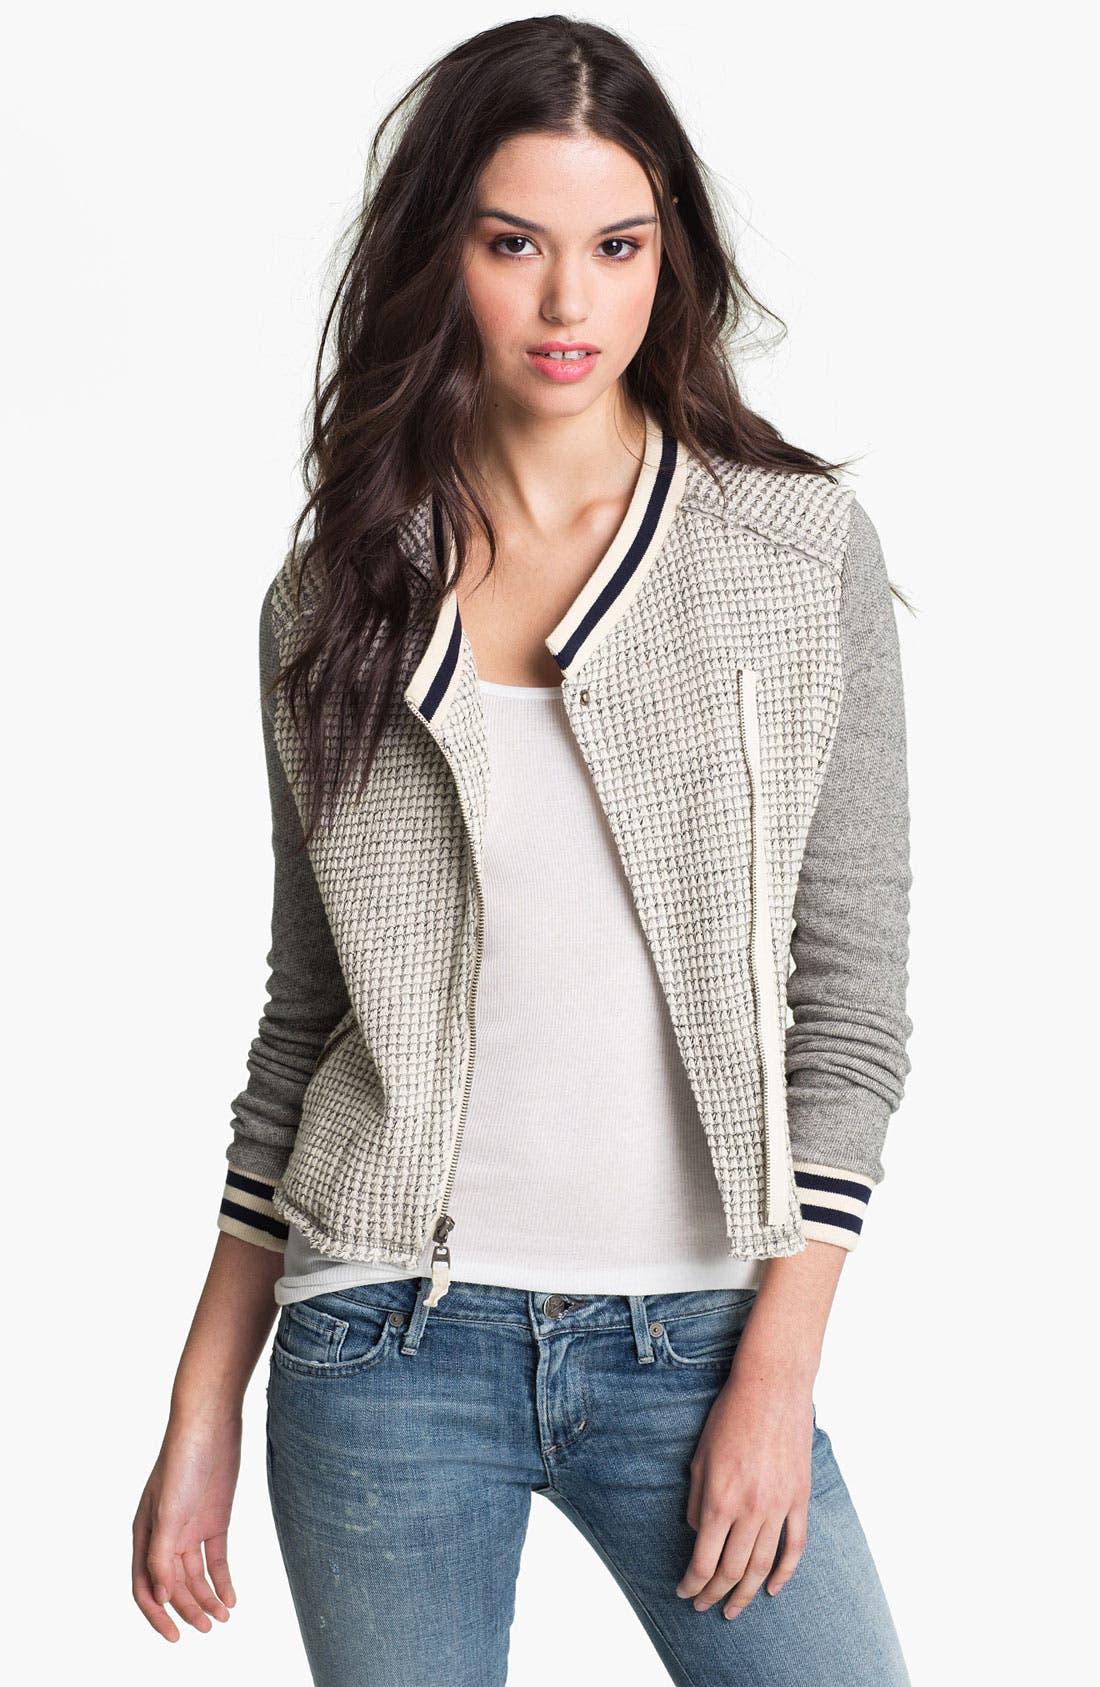 Alternate Image 1 Selected - Splendid 'Rydell' Thermal Varsity Jacket